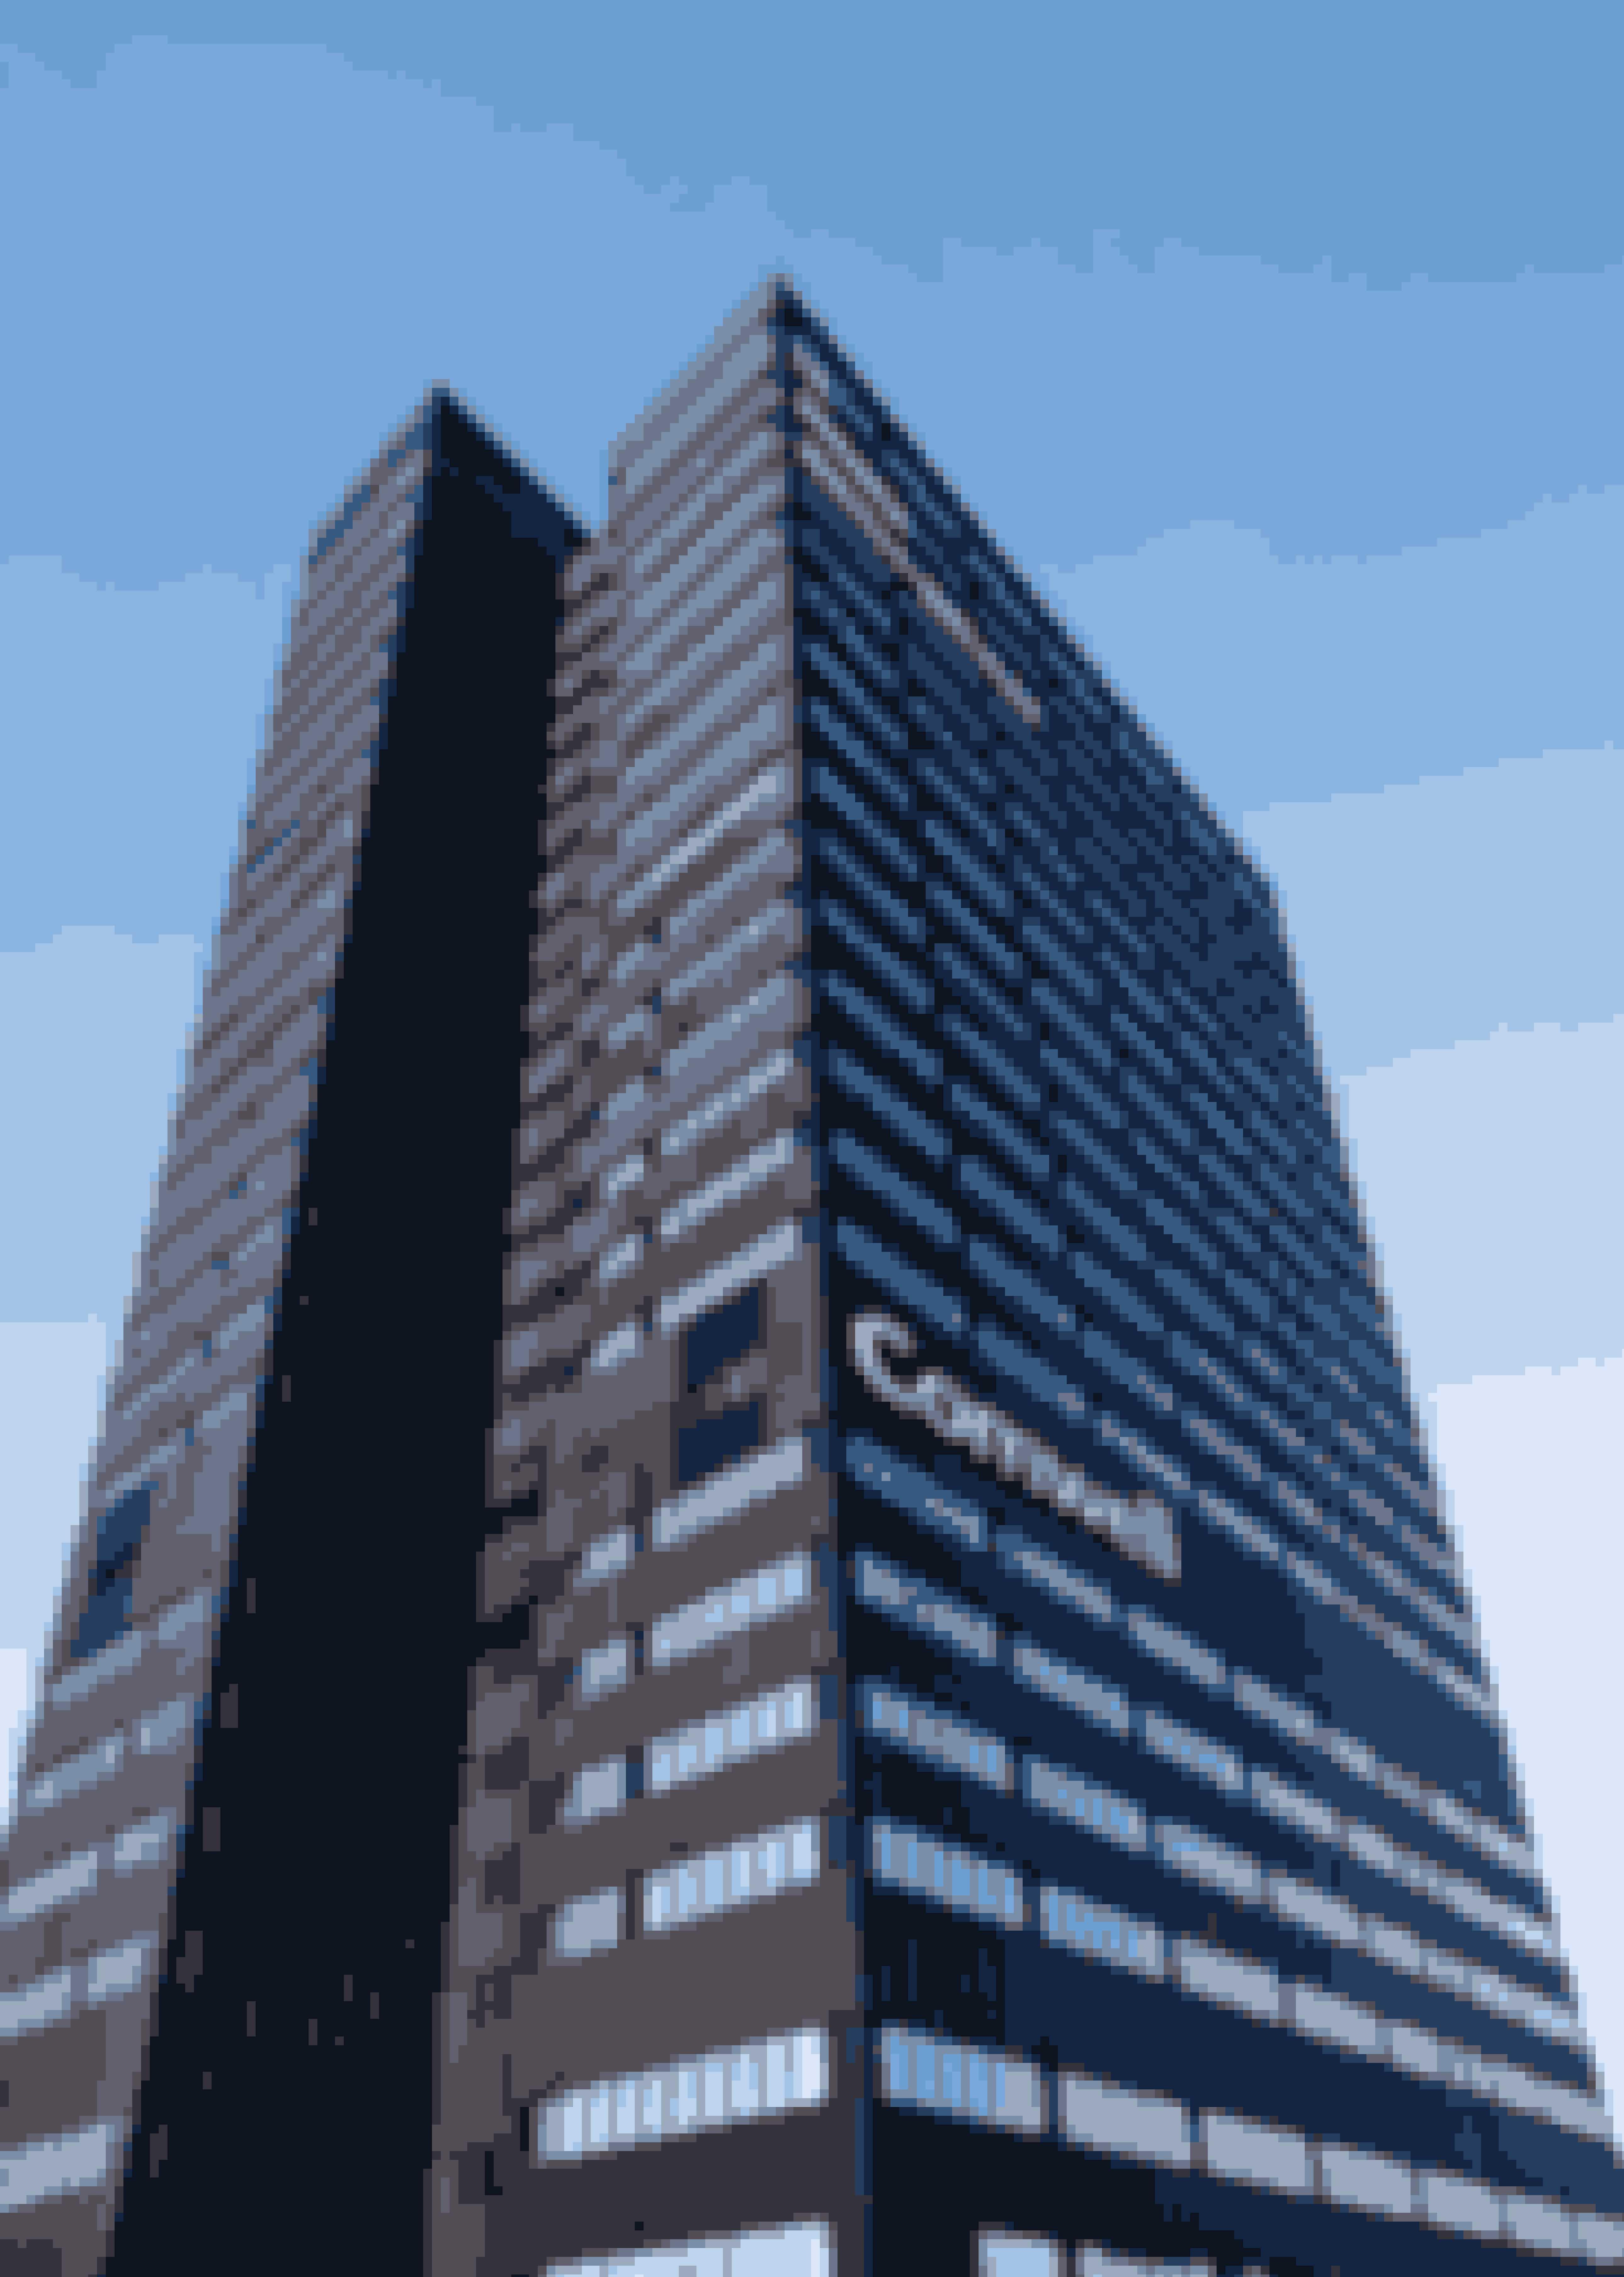 Det lækreComwell Hoteldanner rammerne for Aarhus-eventet denne gang.